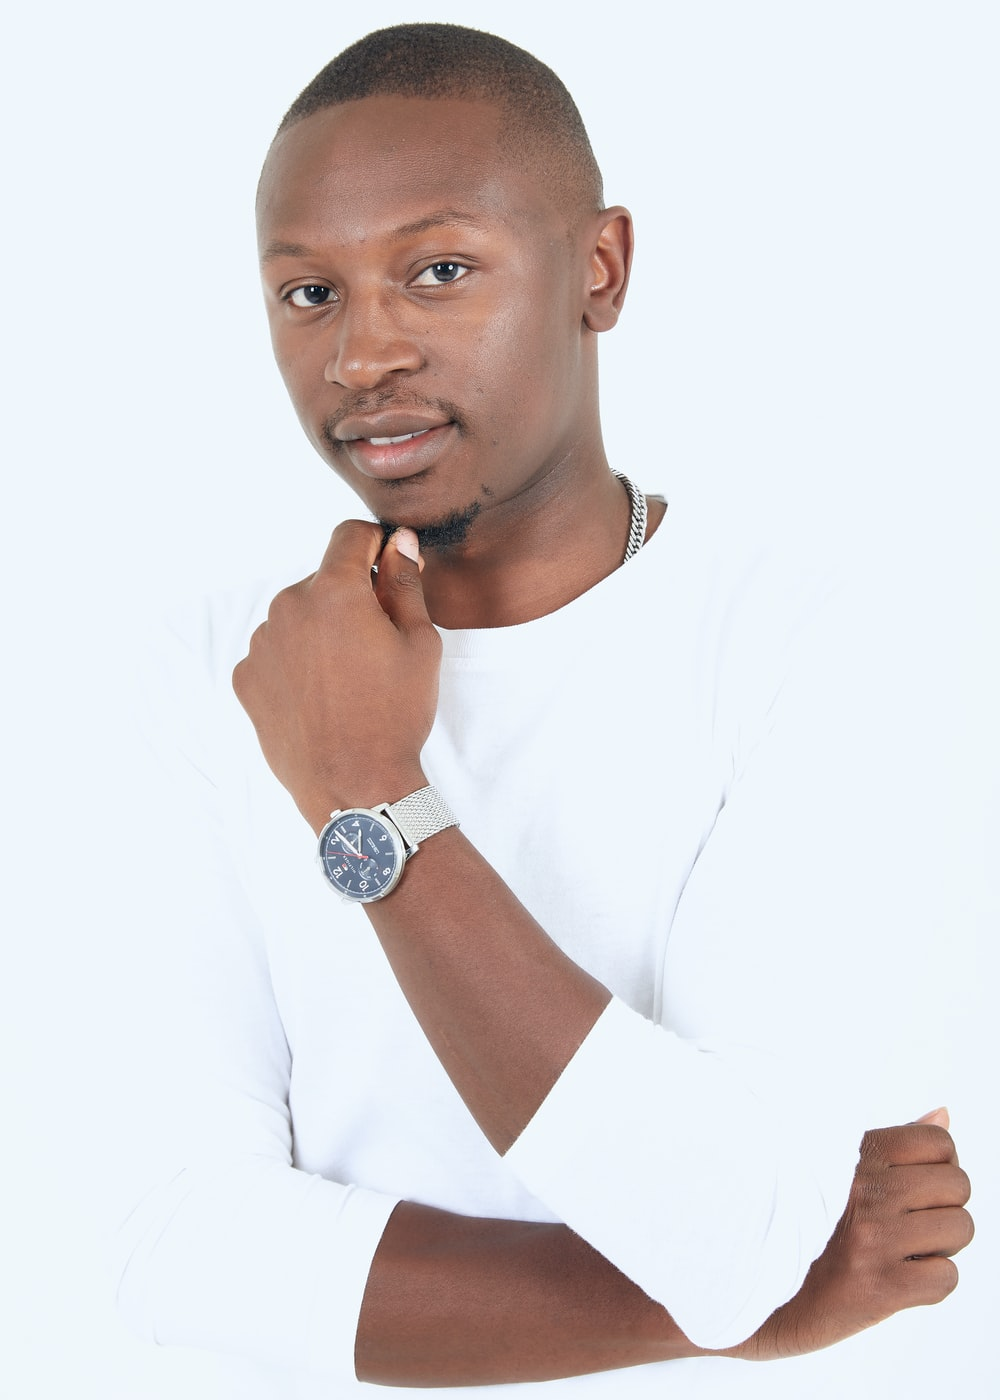 man in white crew neck t-shirt wearing silver round analog watch